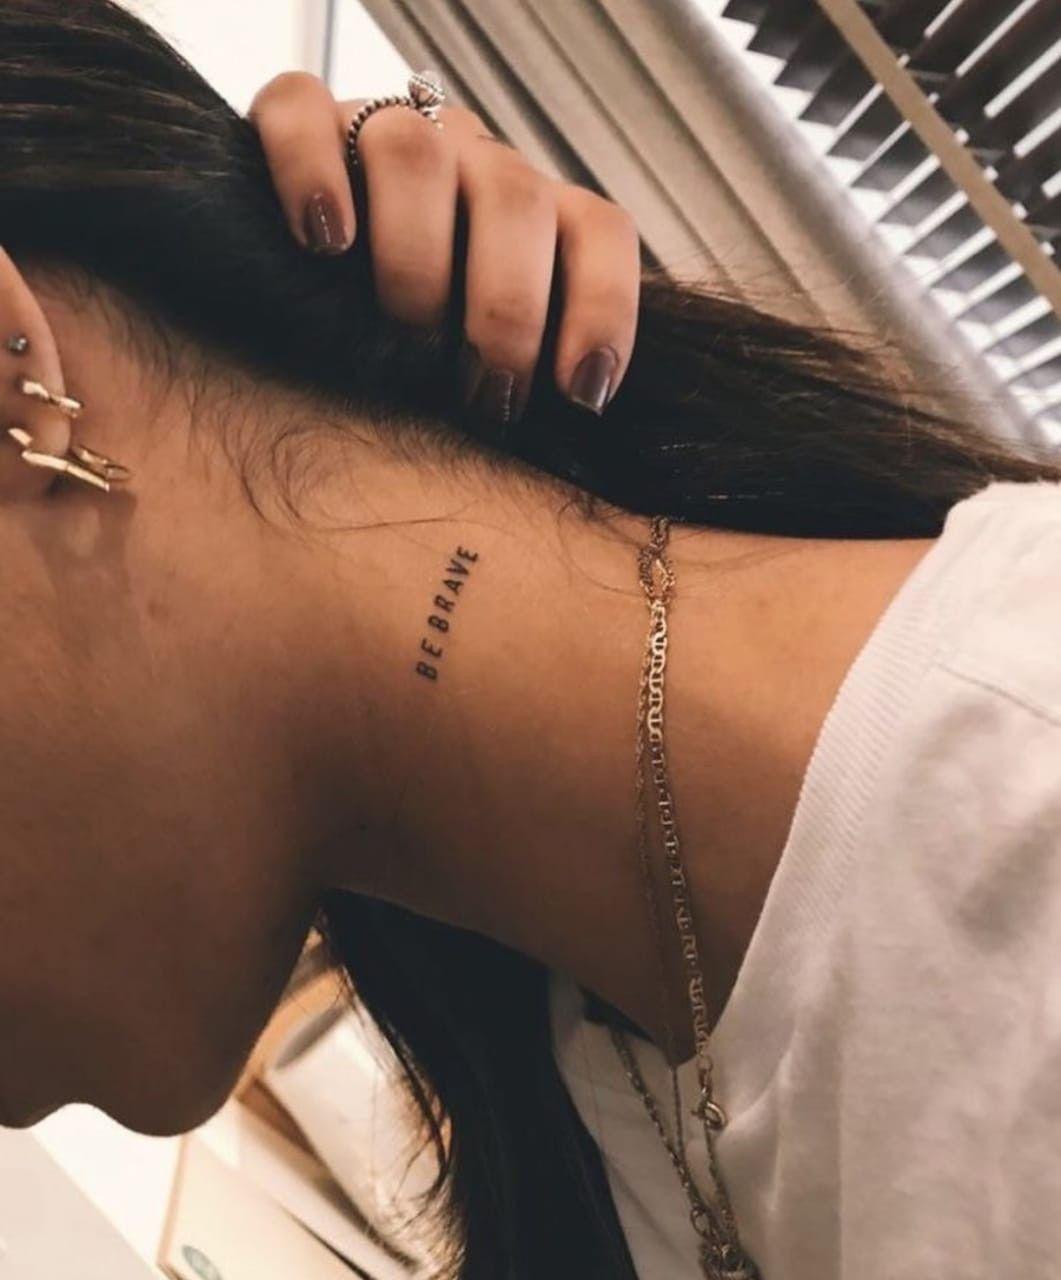 Pin De Vr En Religioso E Agendado Tatuajes Pequenos Cuello Tatuajes Tatuaje Del Cuello